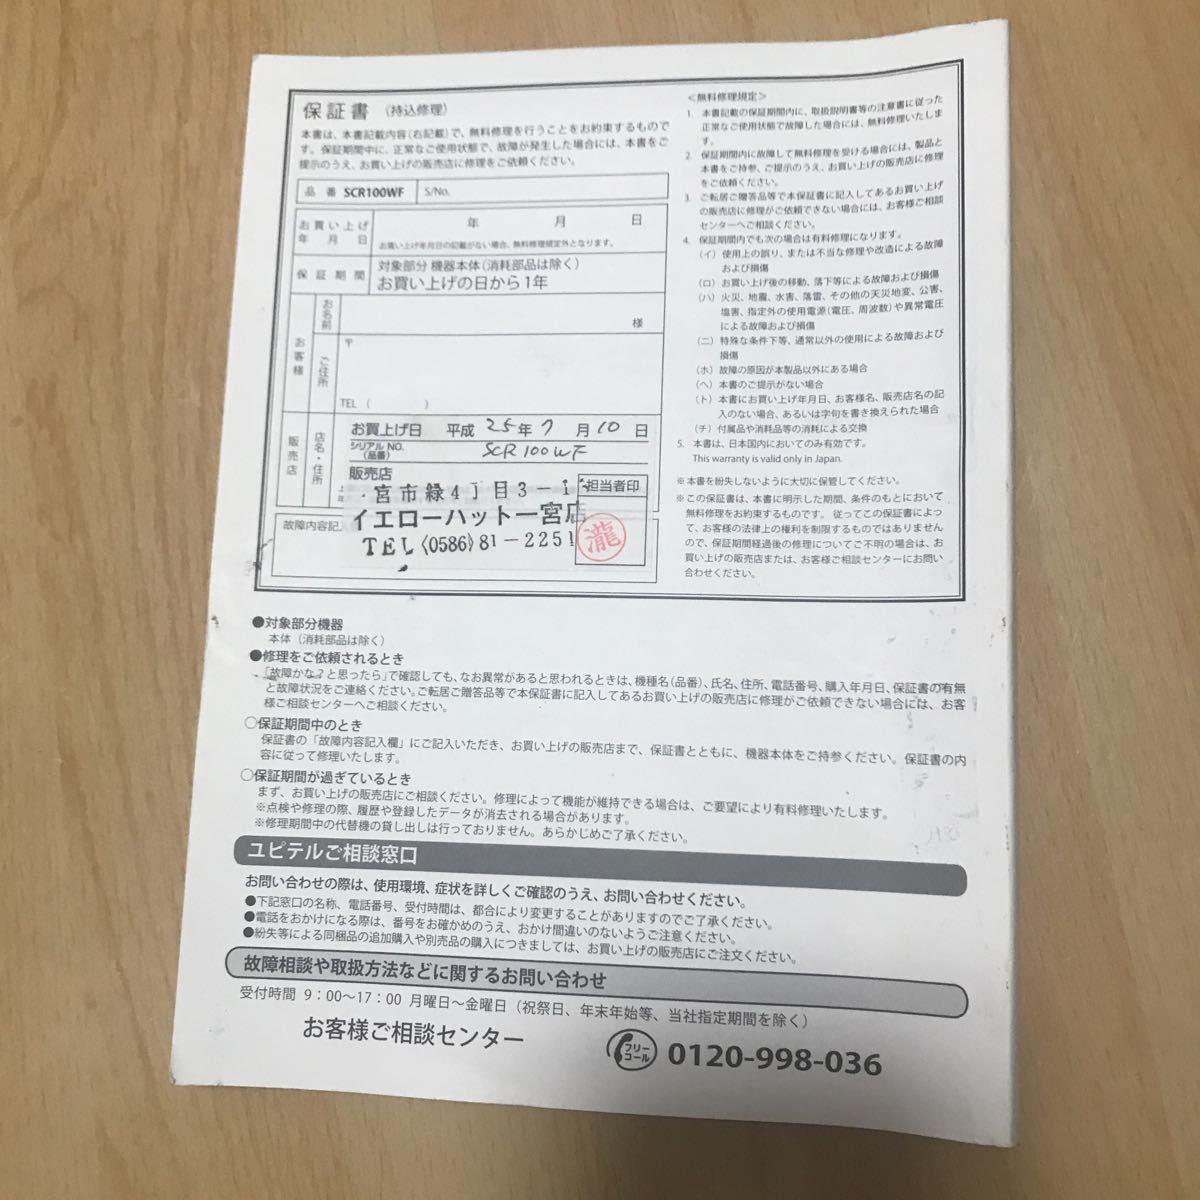 YUPITERU ユピテル スーパーキャット レーダー探知機 取扱説明書/SCR100WF/中古品送料込_画像3